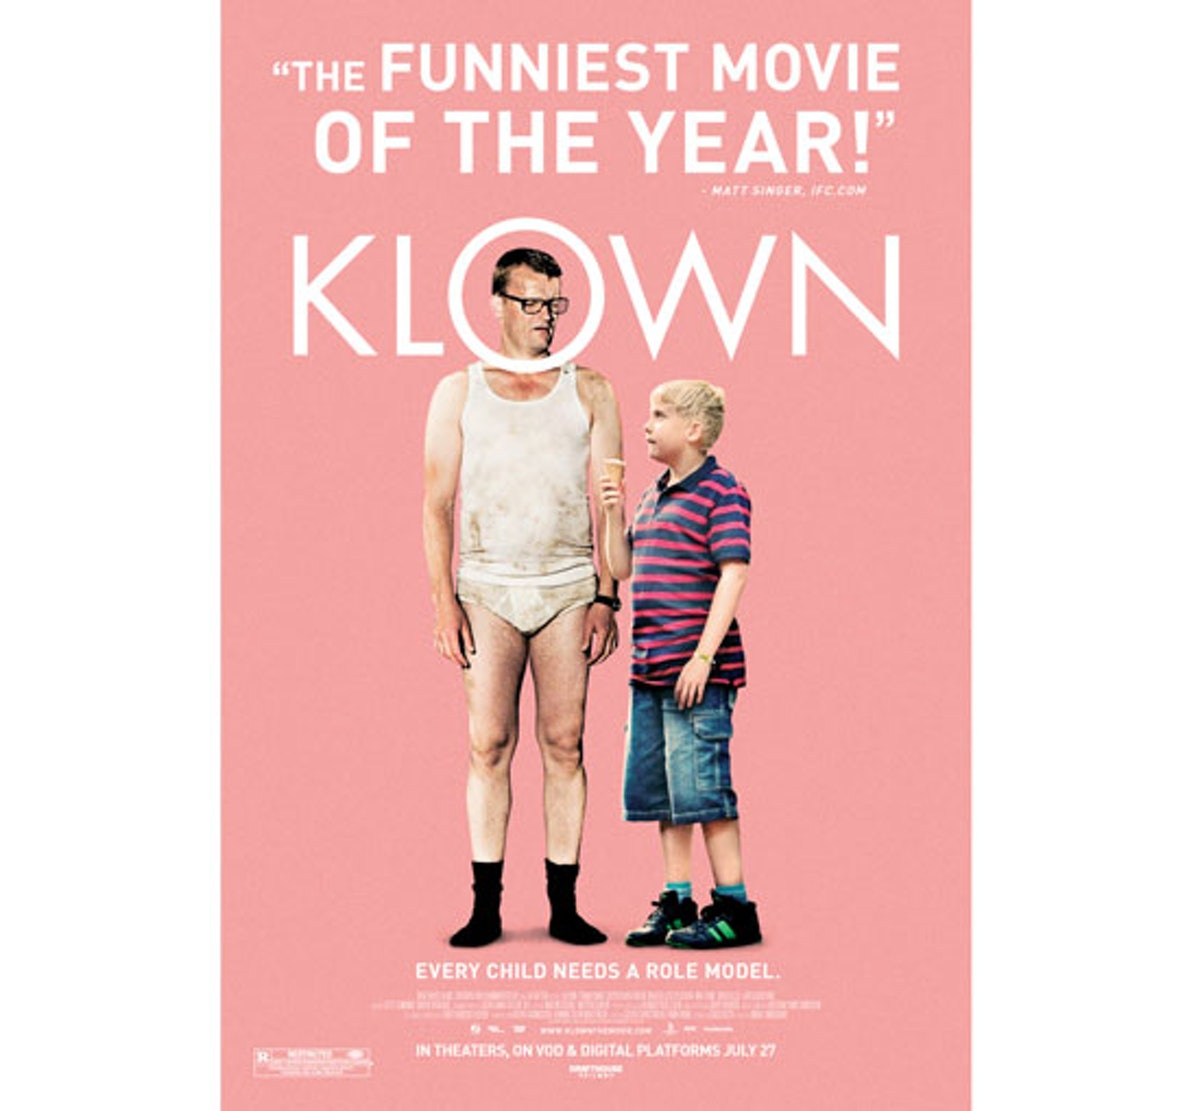 blog-klown-movie-poster-01.jpg